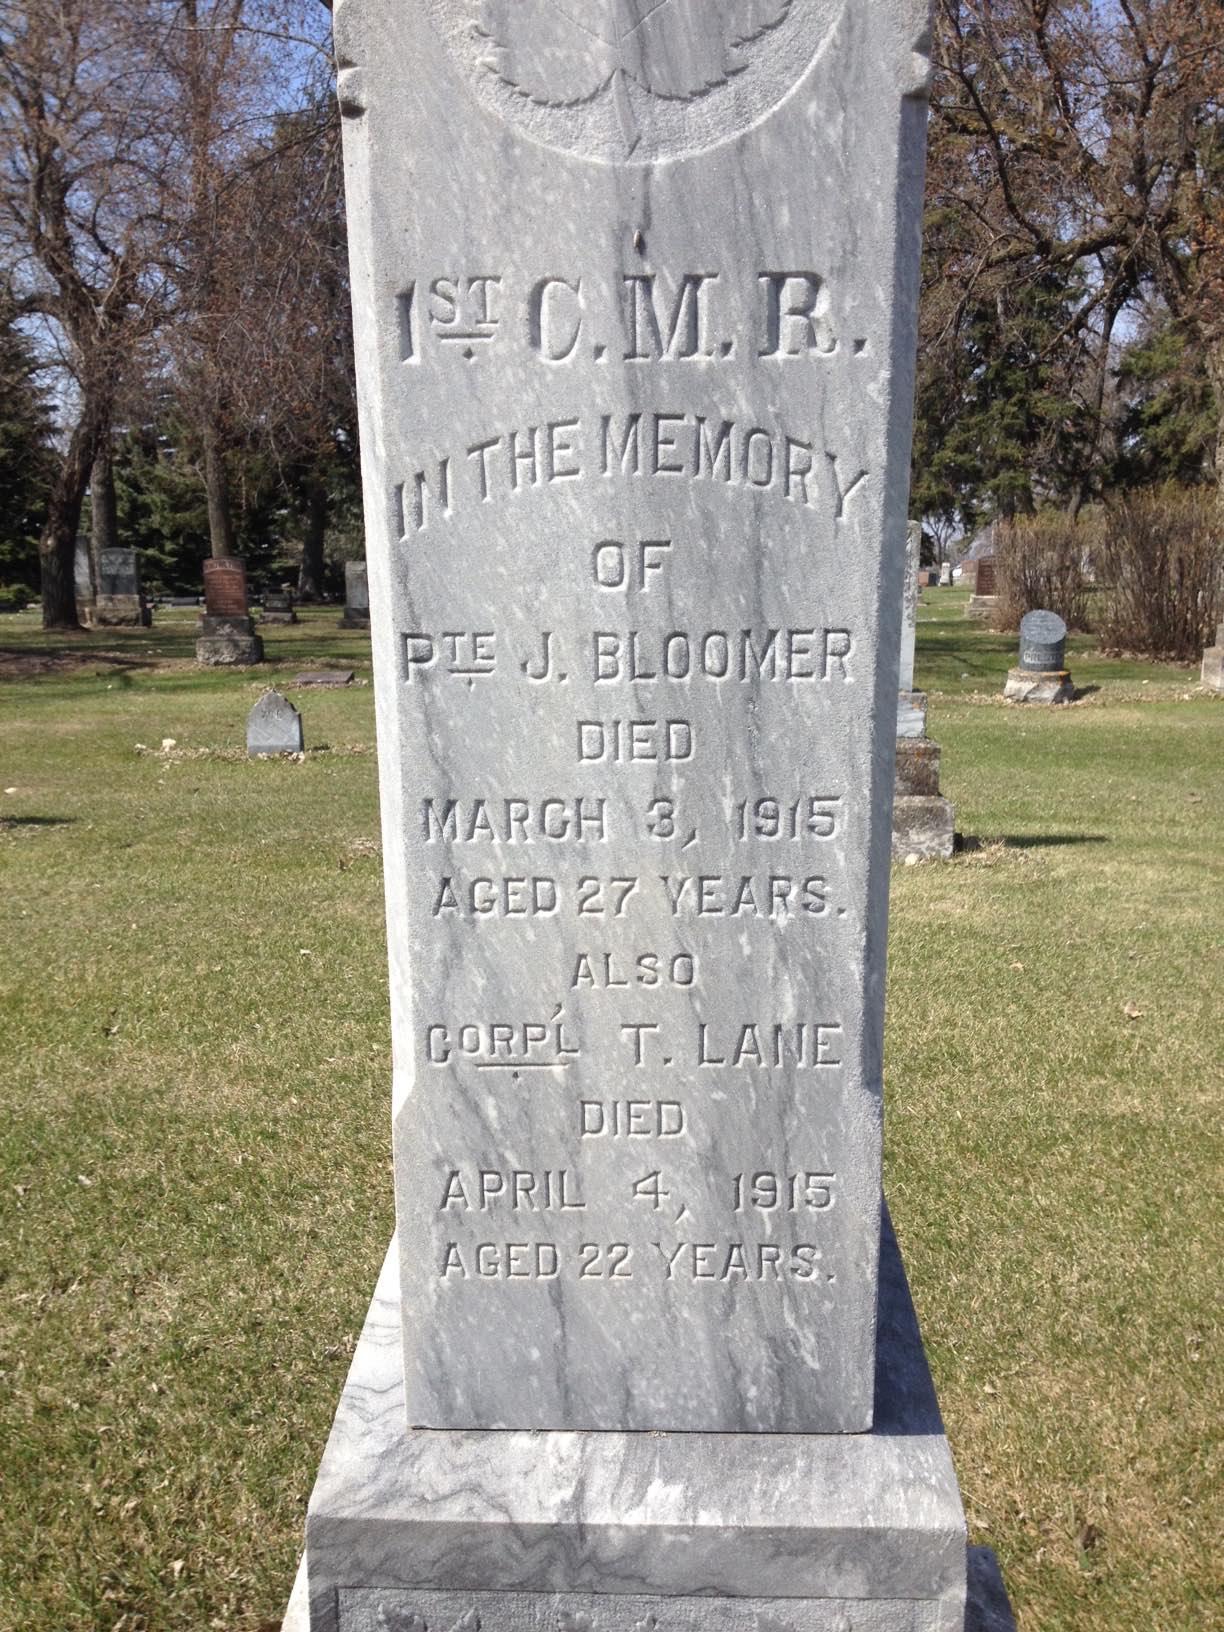 Inscription– Closeup of original grave marker for Pte Bloomer (1st CMR) at the Brandon Municipal Cemetery (Brandon, MB, Canada), Section 16 Block C Plot 24